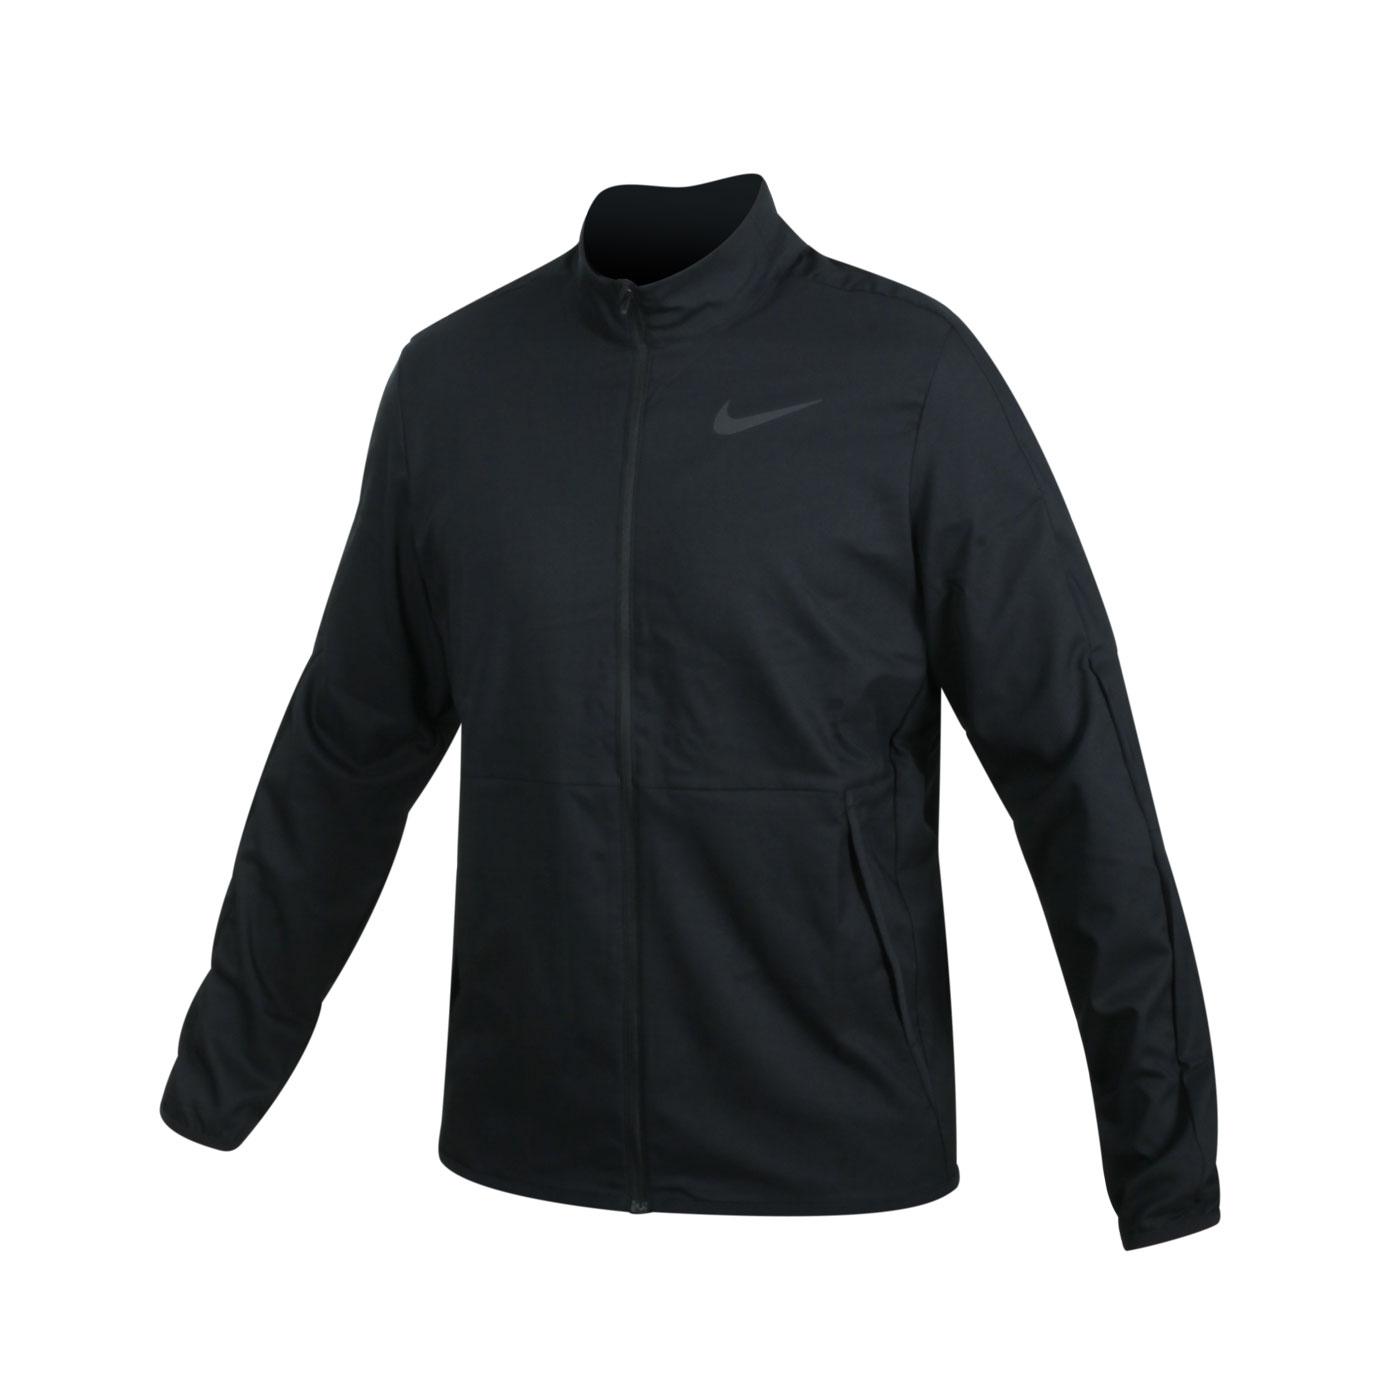 NIKE 男款吸濕排汗訓練外套 CU4954-010